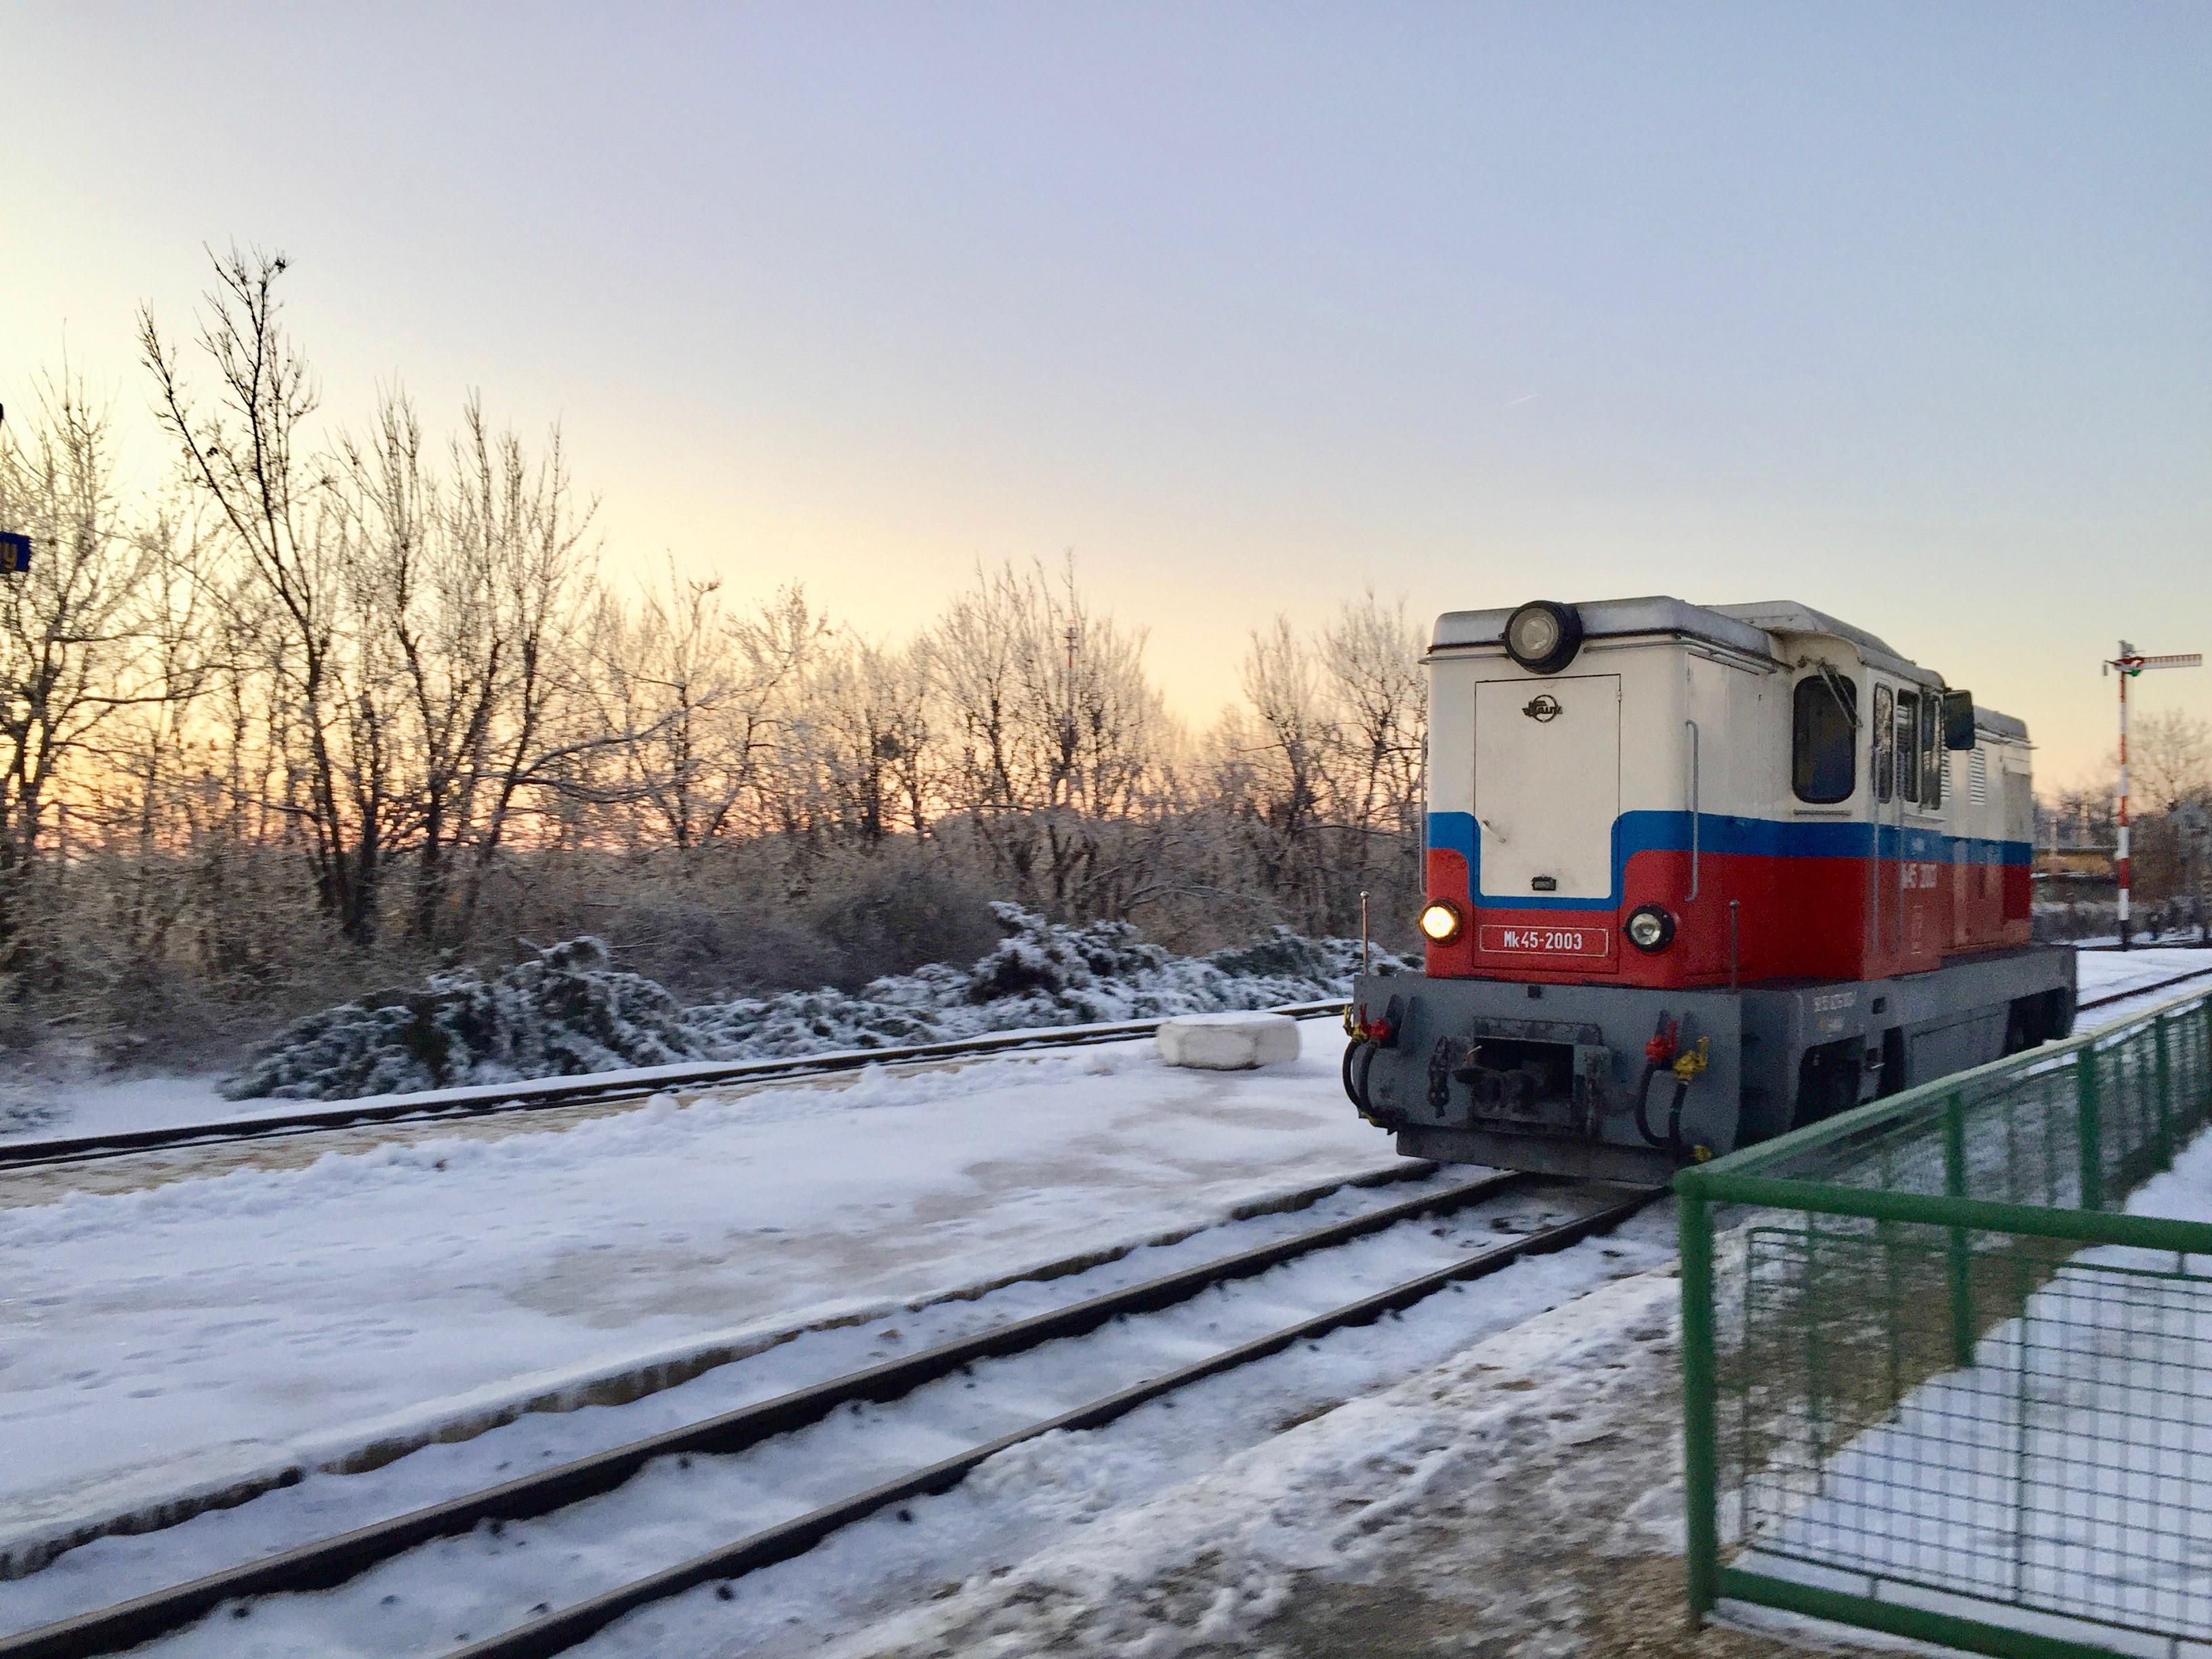 budapest train